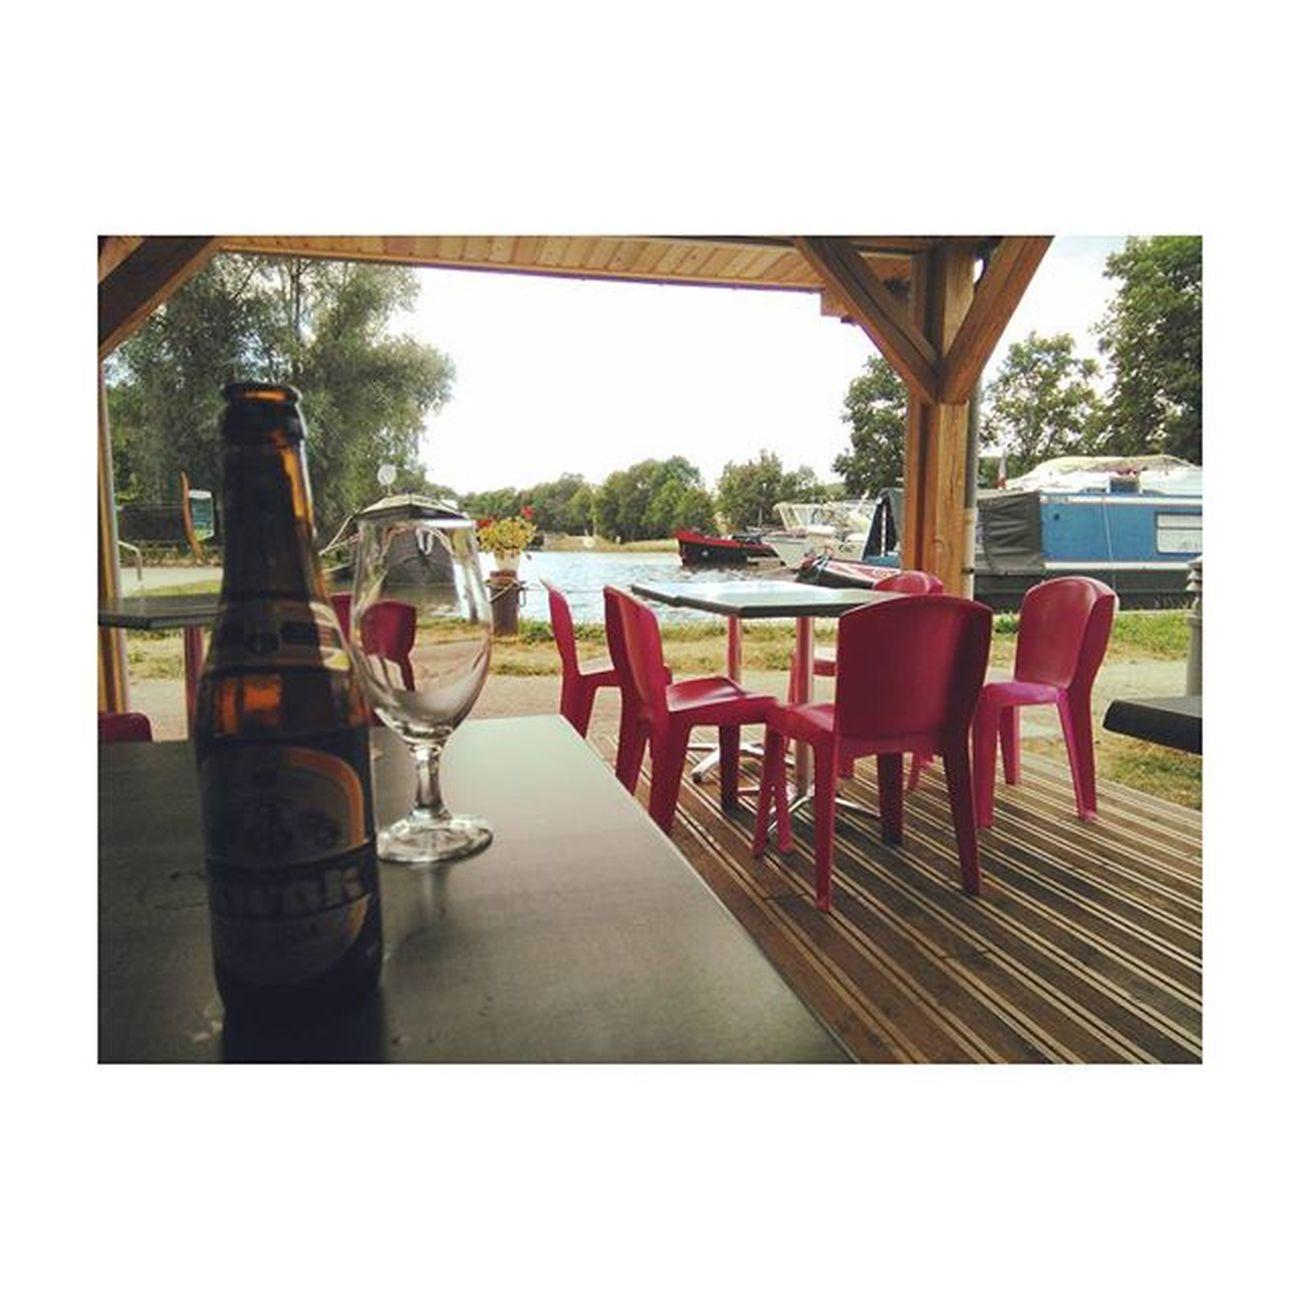 Cervecitaspotentes Kwak 8°